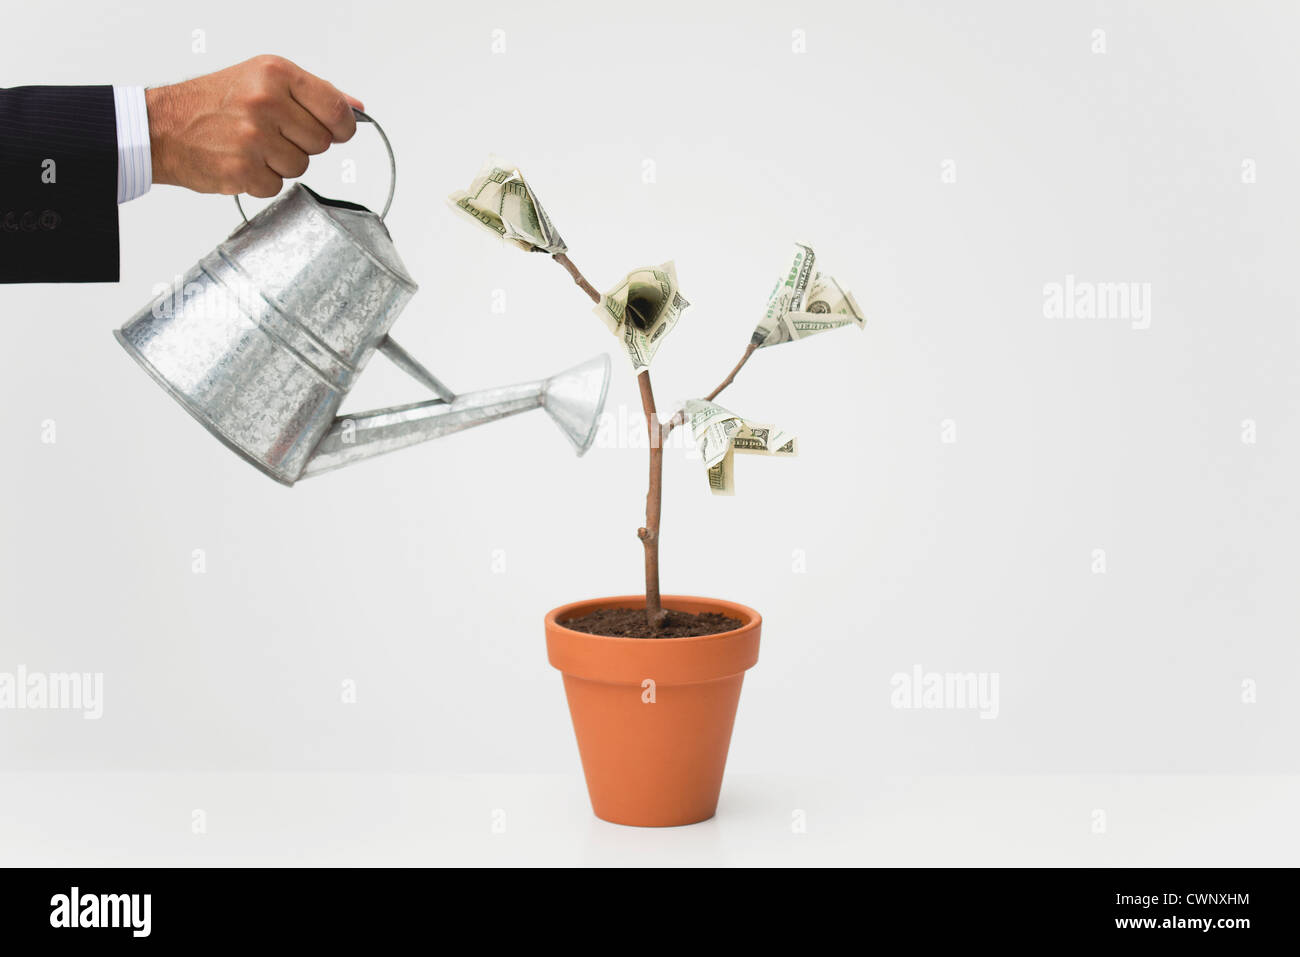 Geschäftsmann Bewässerung Topfpflanzen Geldbaum, beschnitten Stockbild